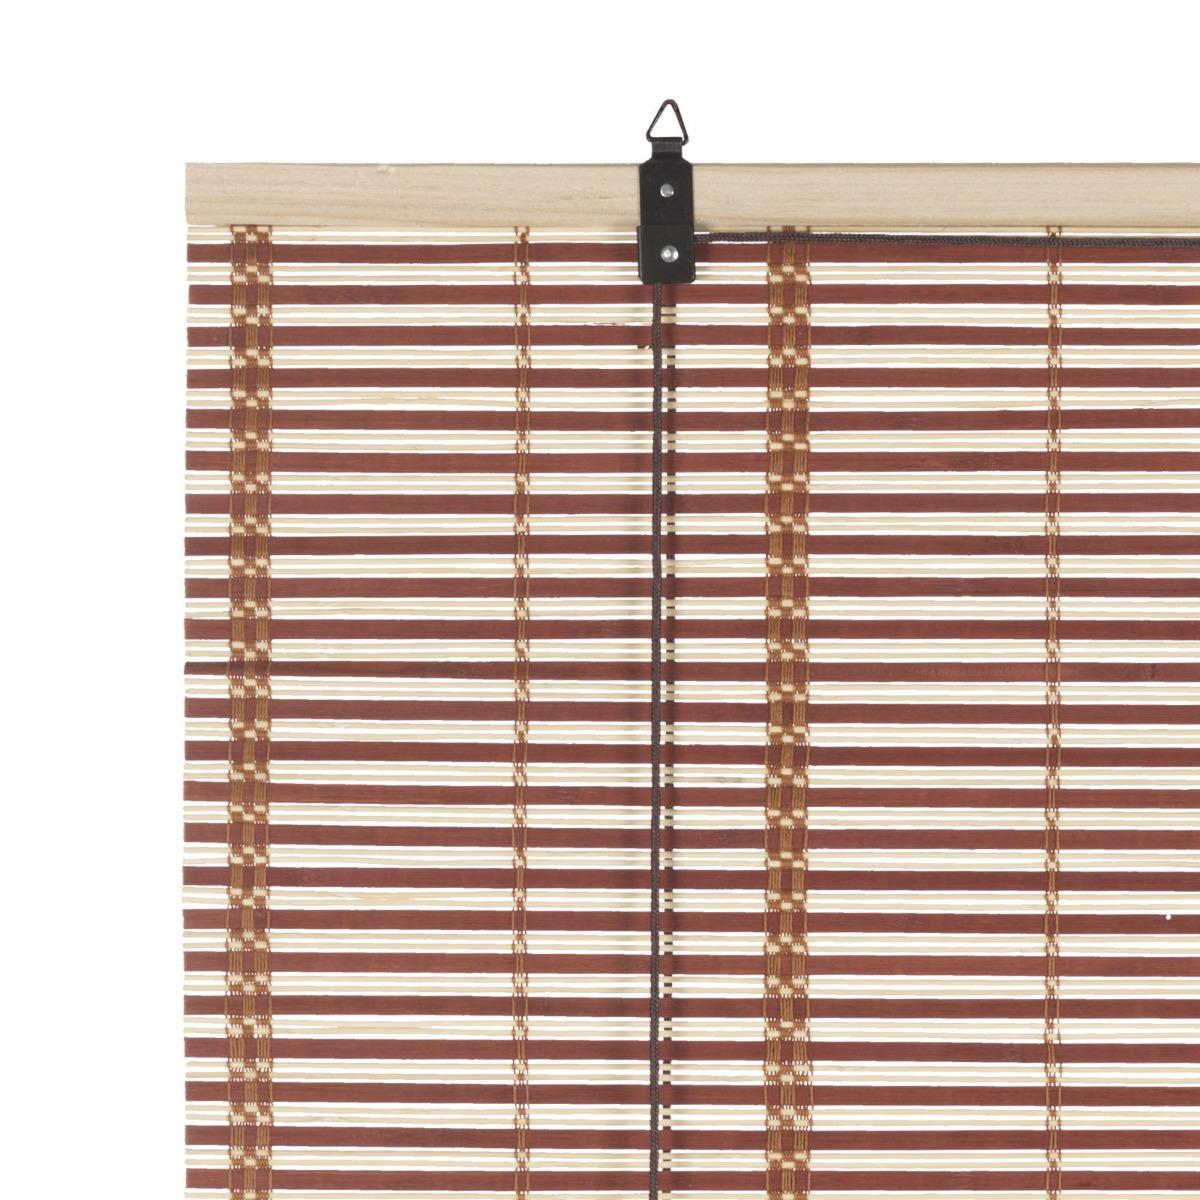 Tapparella las vegas bamboo arredamento casa stile for Ebay arredamento casa